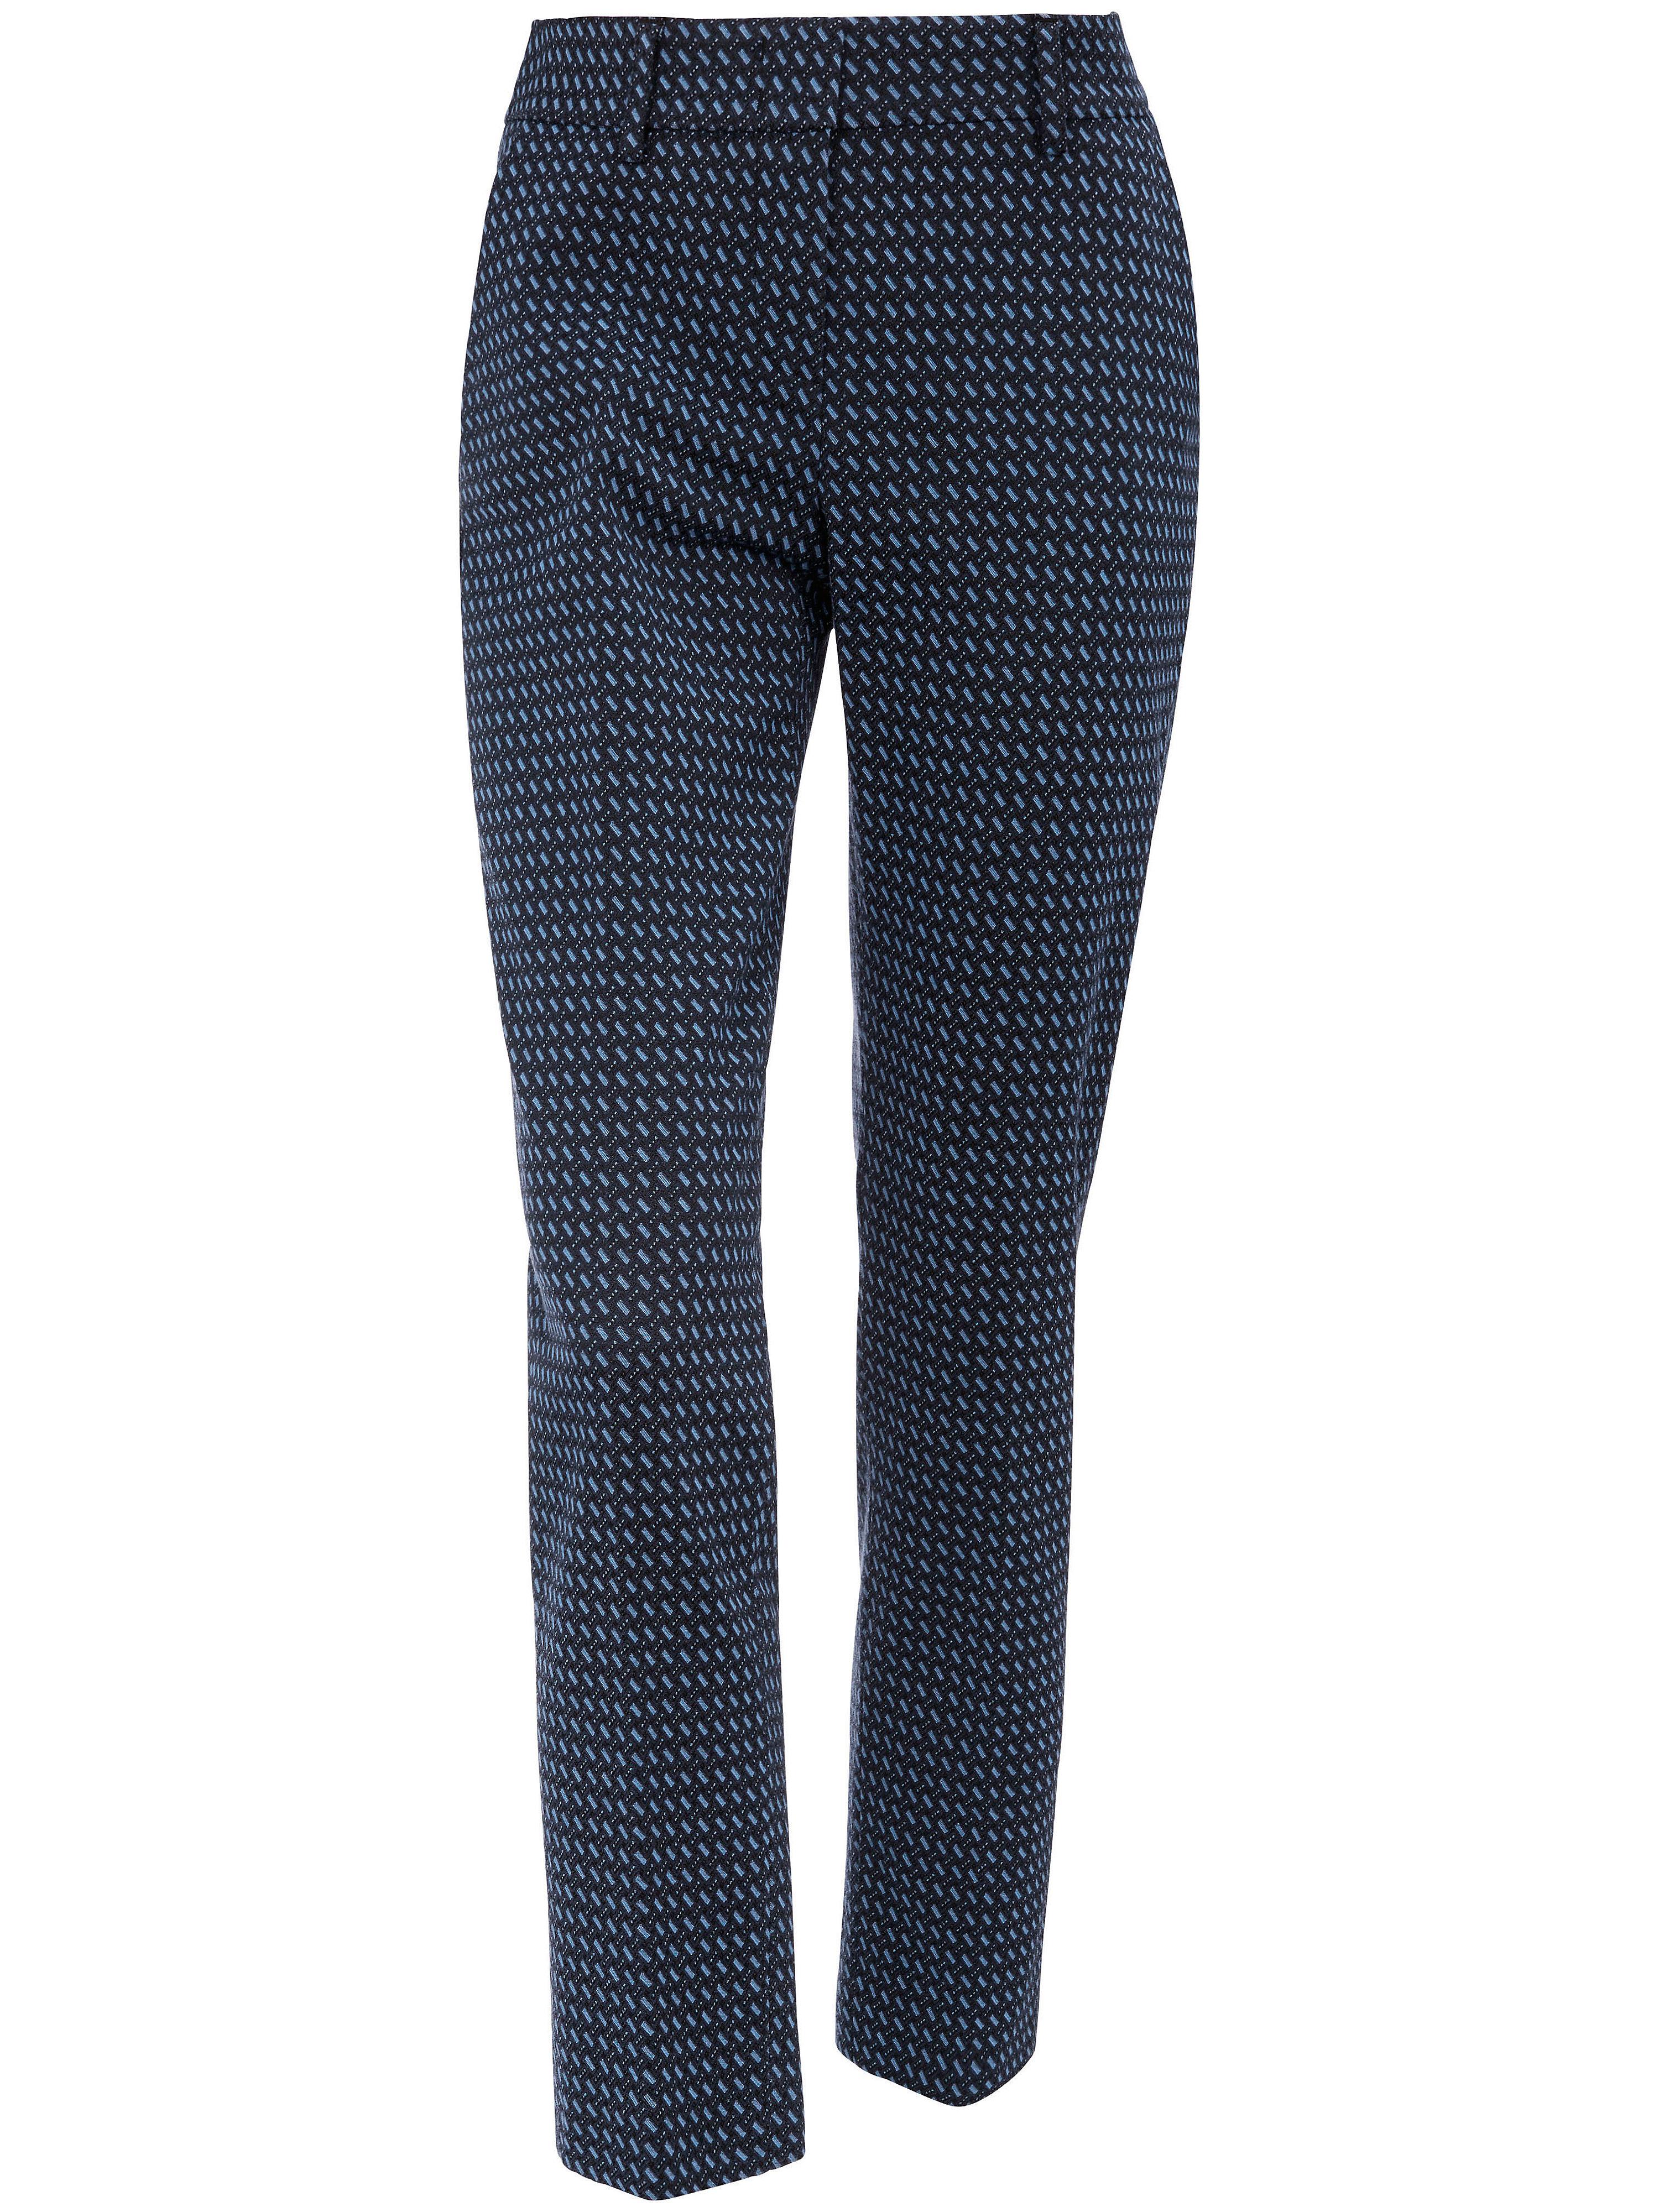 Le pantalon 7/8 - Modèle DORA  Raffaello Rossi bleu